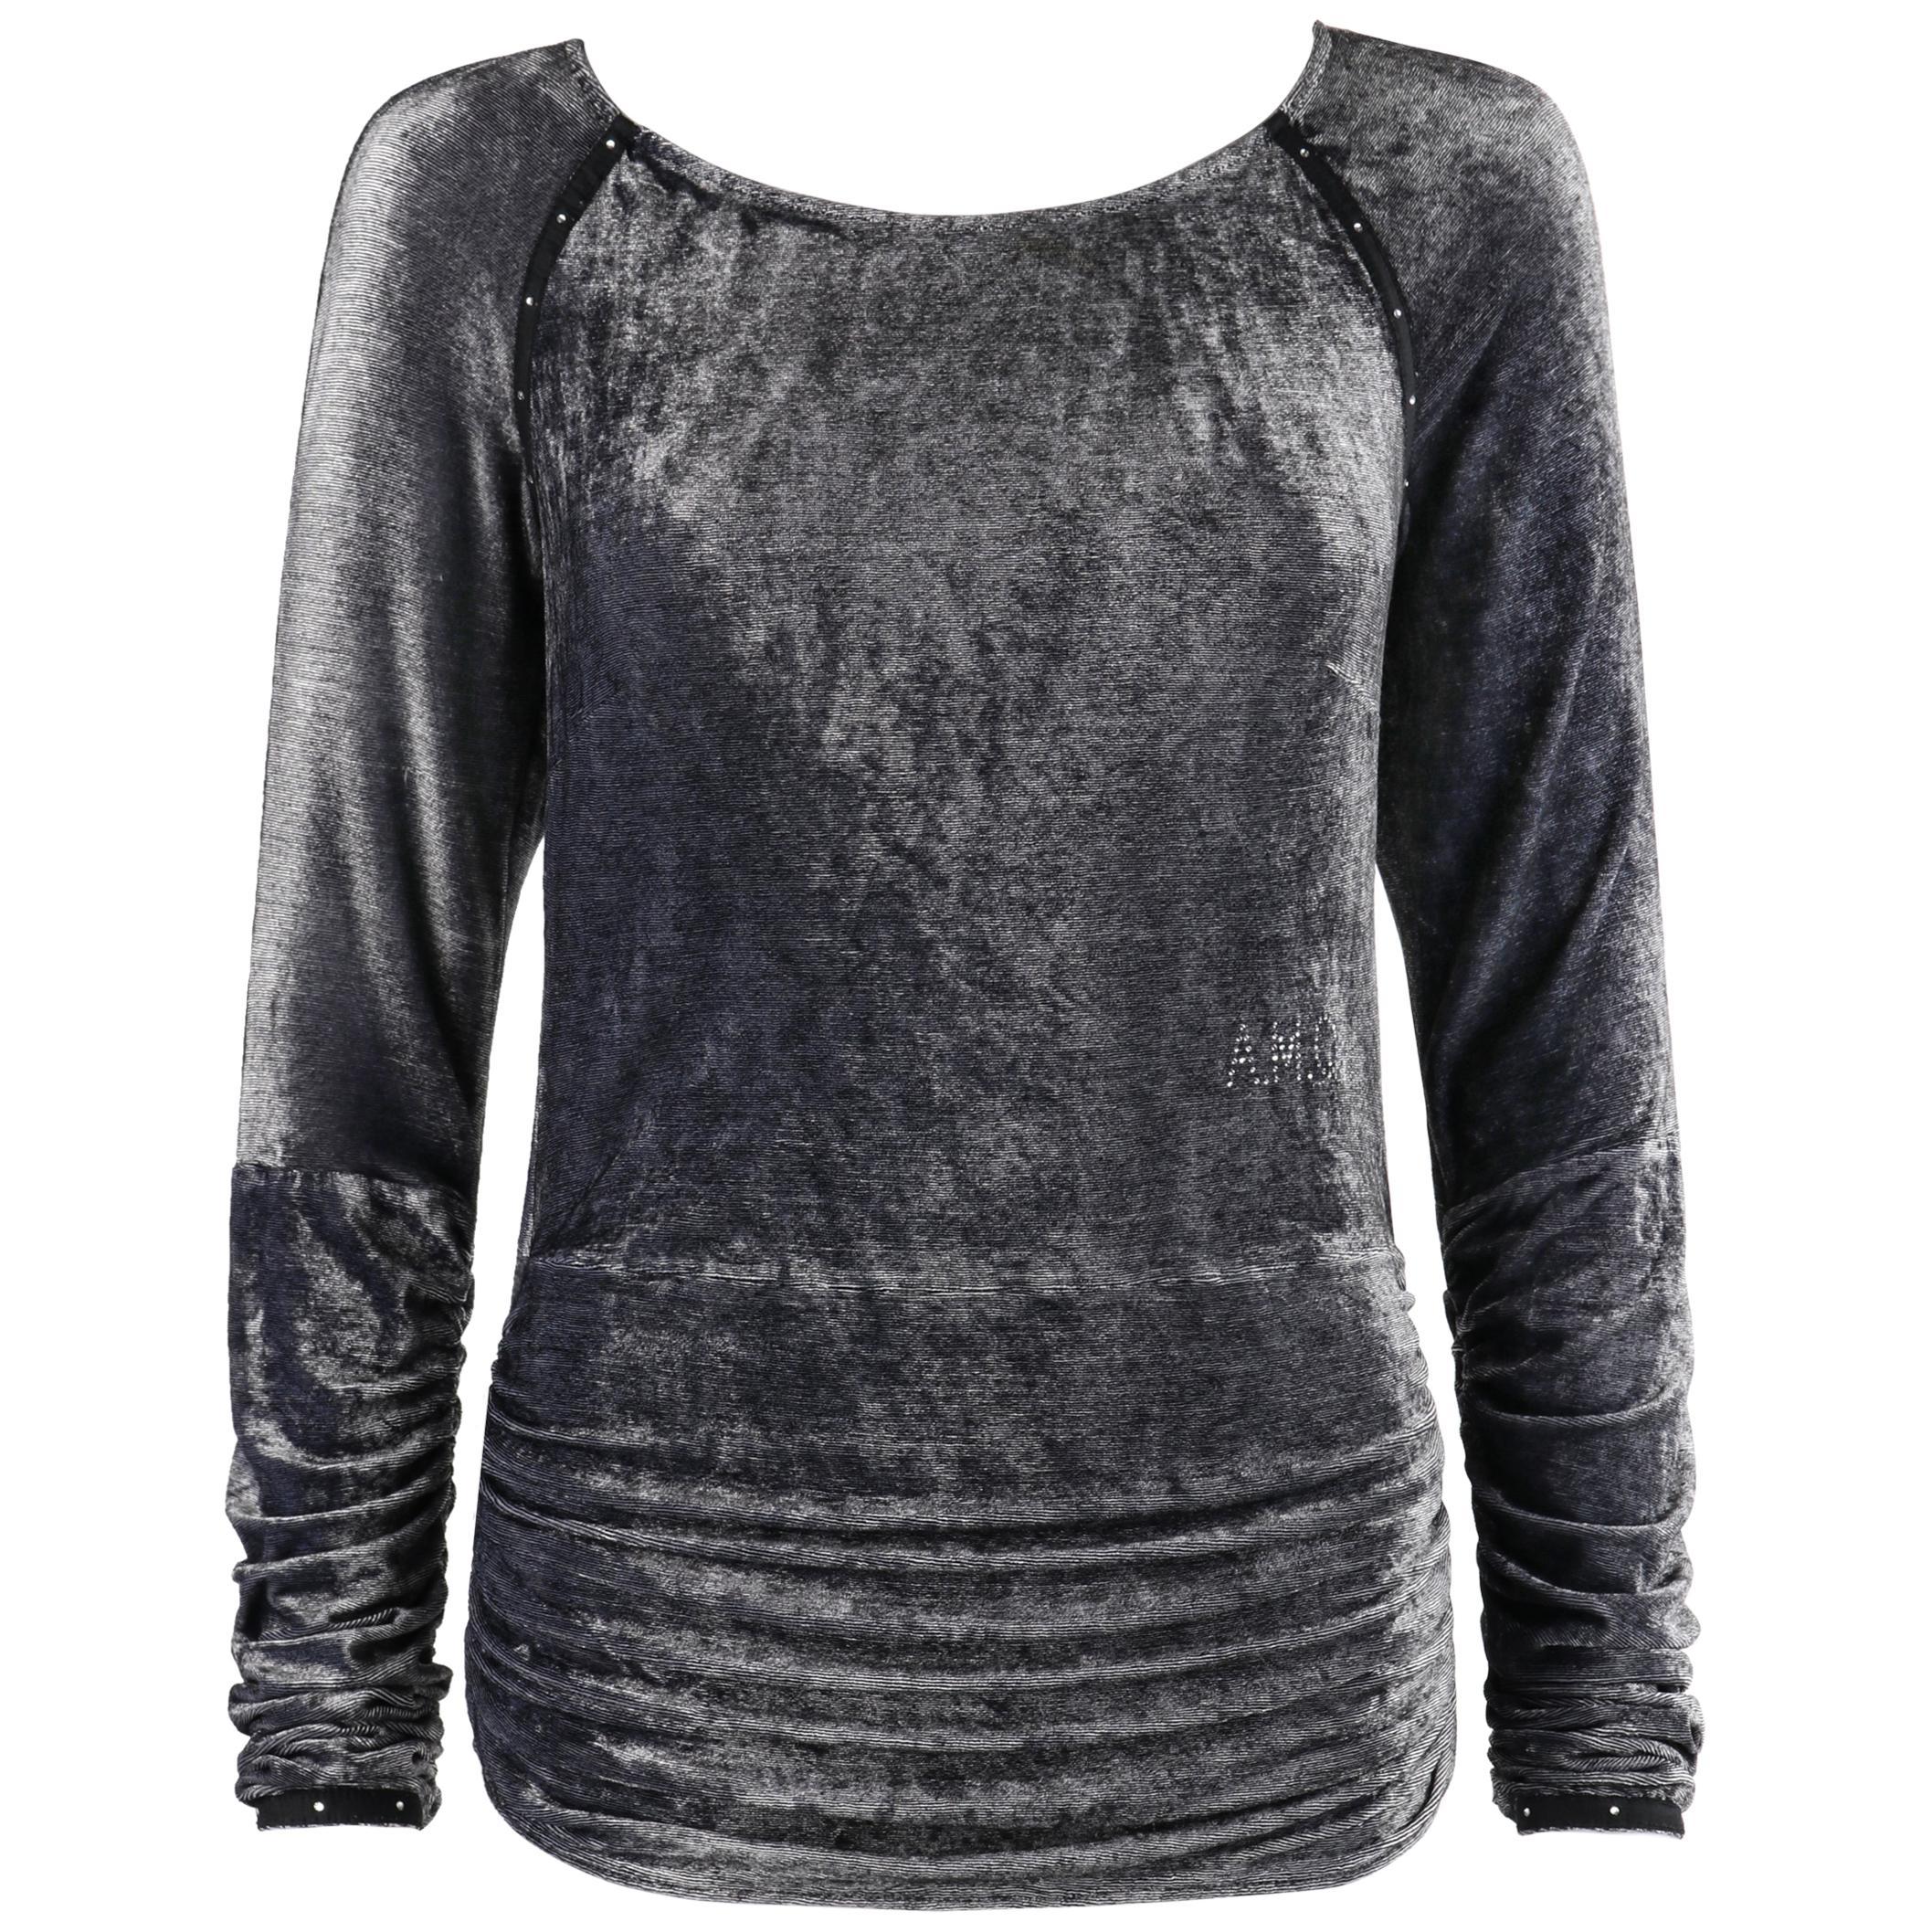 ALEXANDER McQUEEN c.1996 Gray Embellished Crushed Velvet Long Sleeve Top